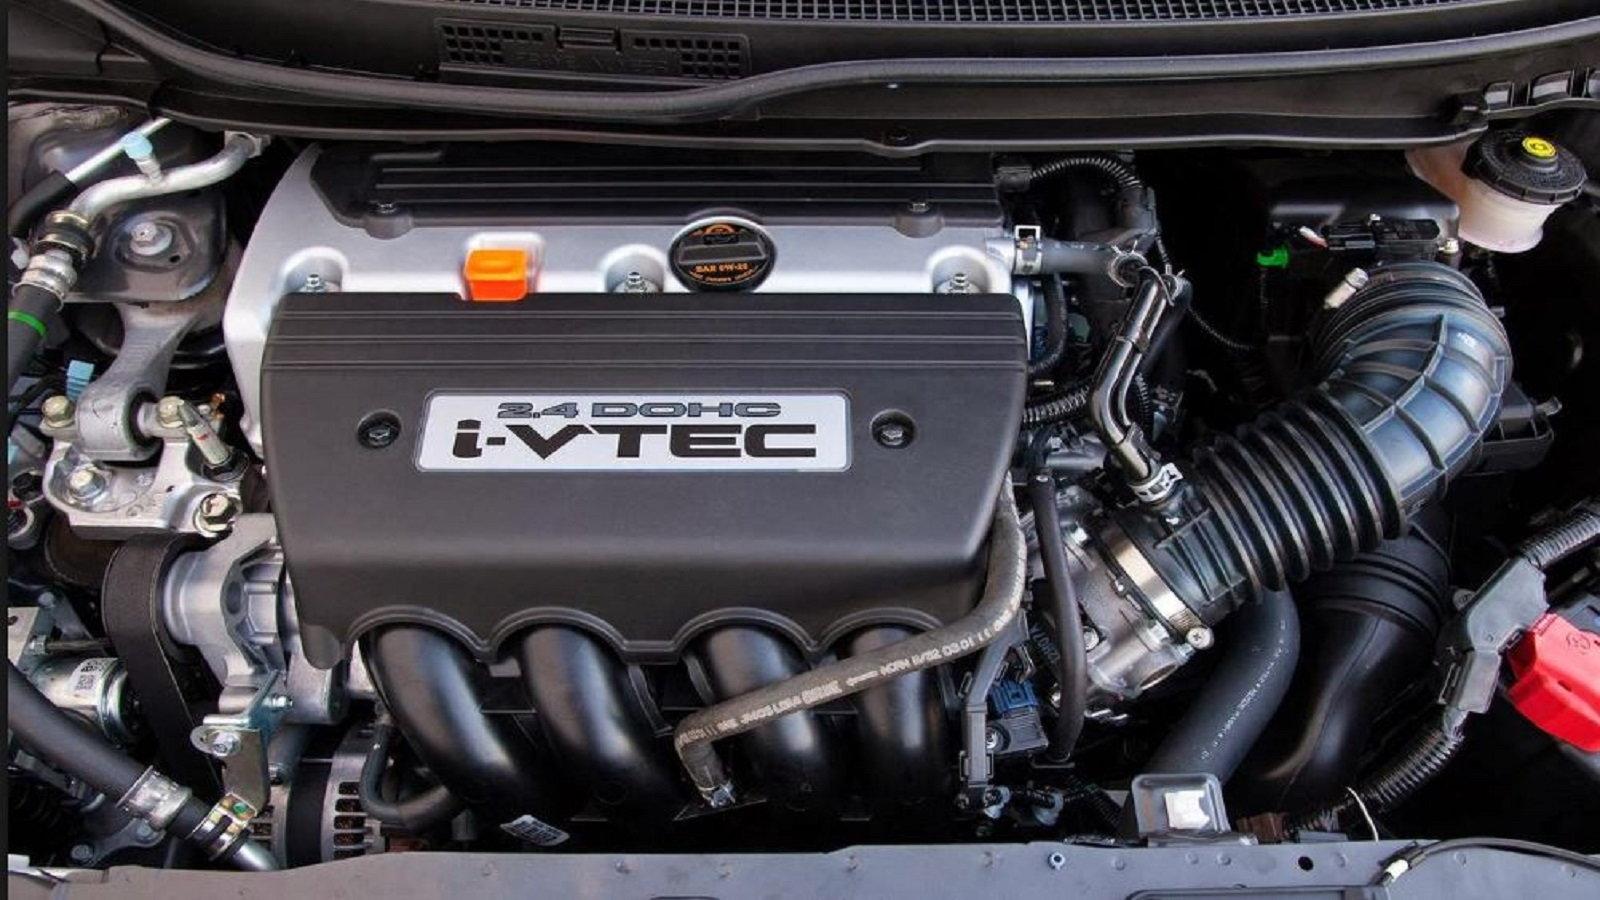 The VTEC